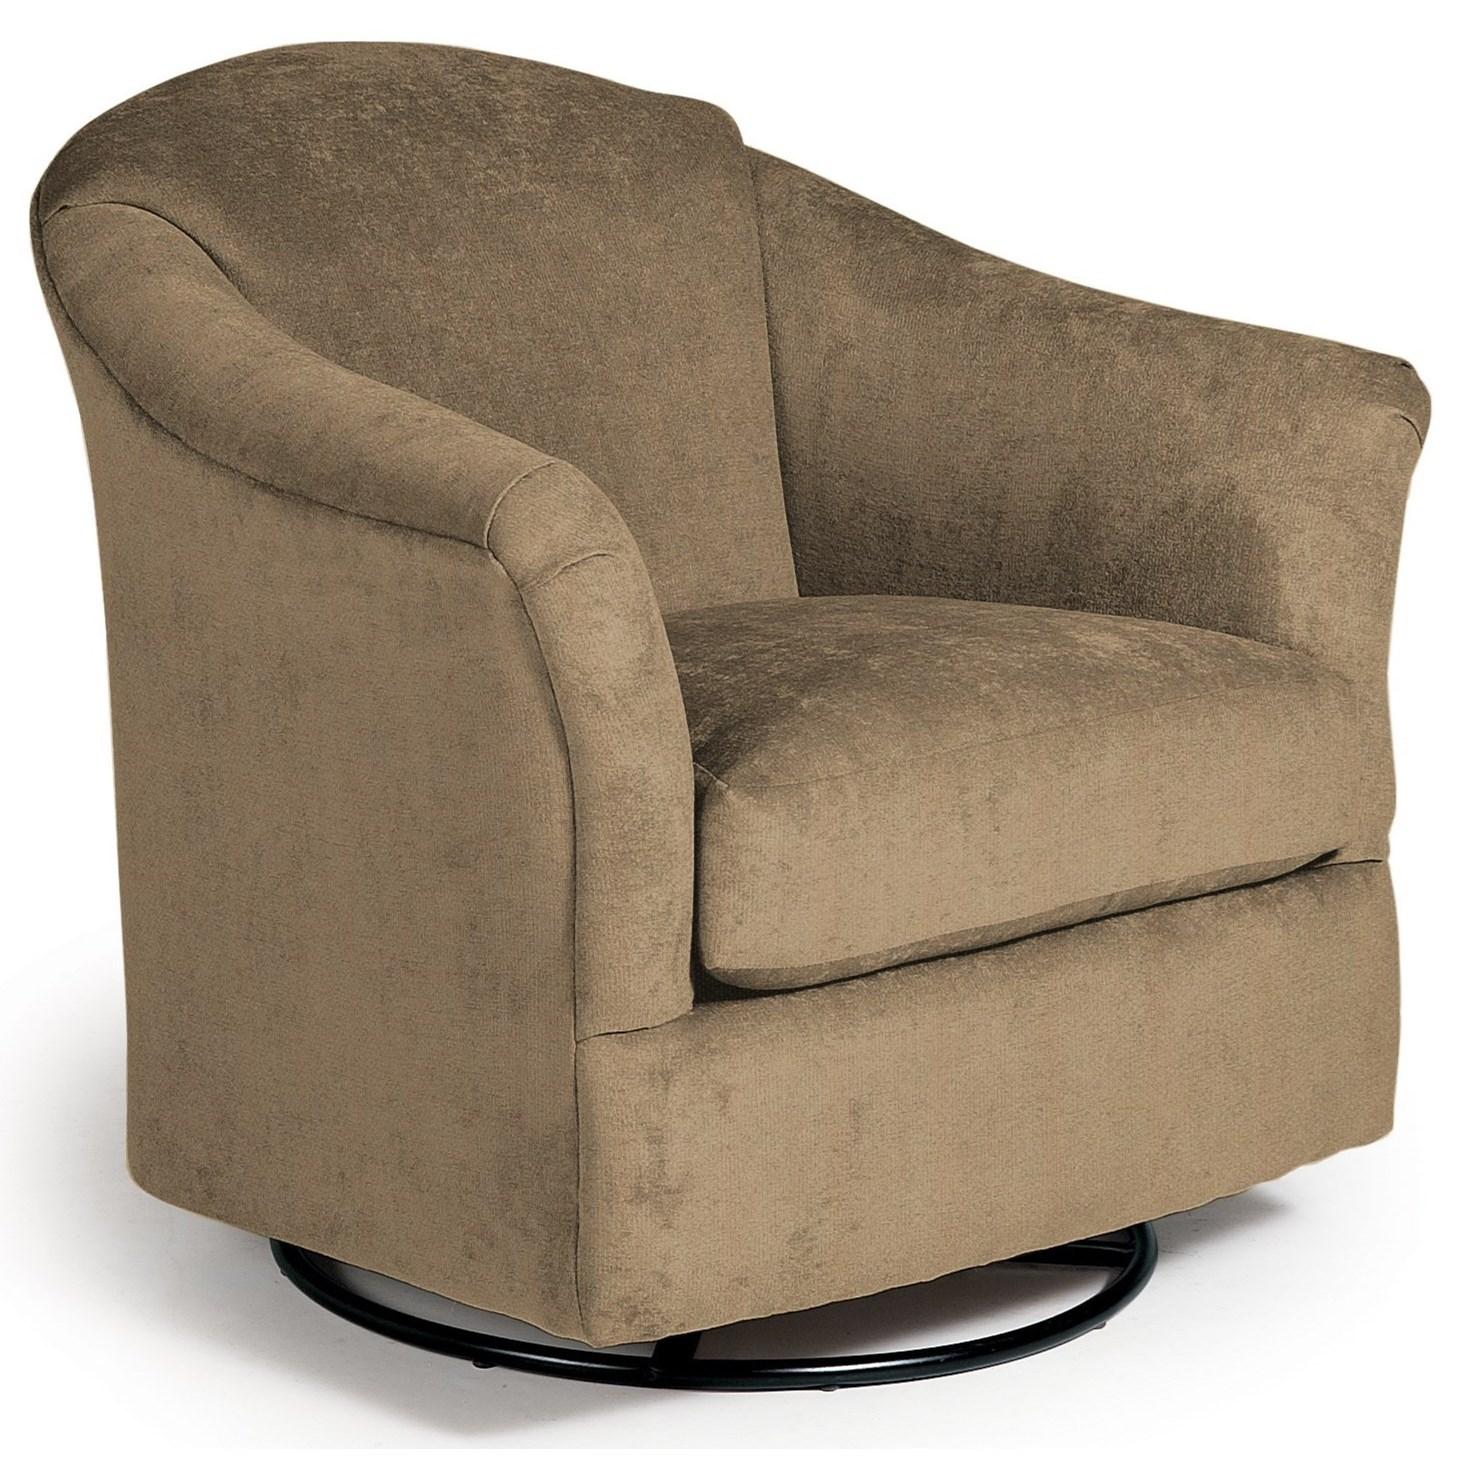 Best Home Furnishings Swivel Glide Chairs Darby Swivel Glider Chair